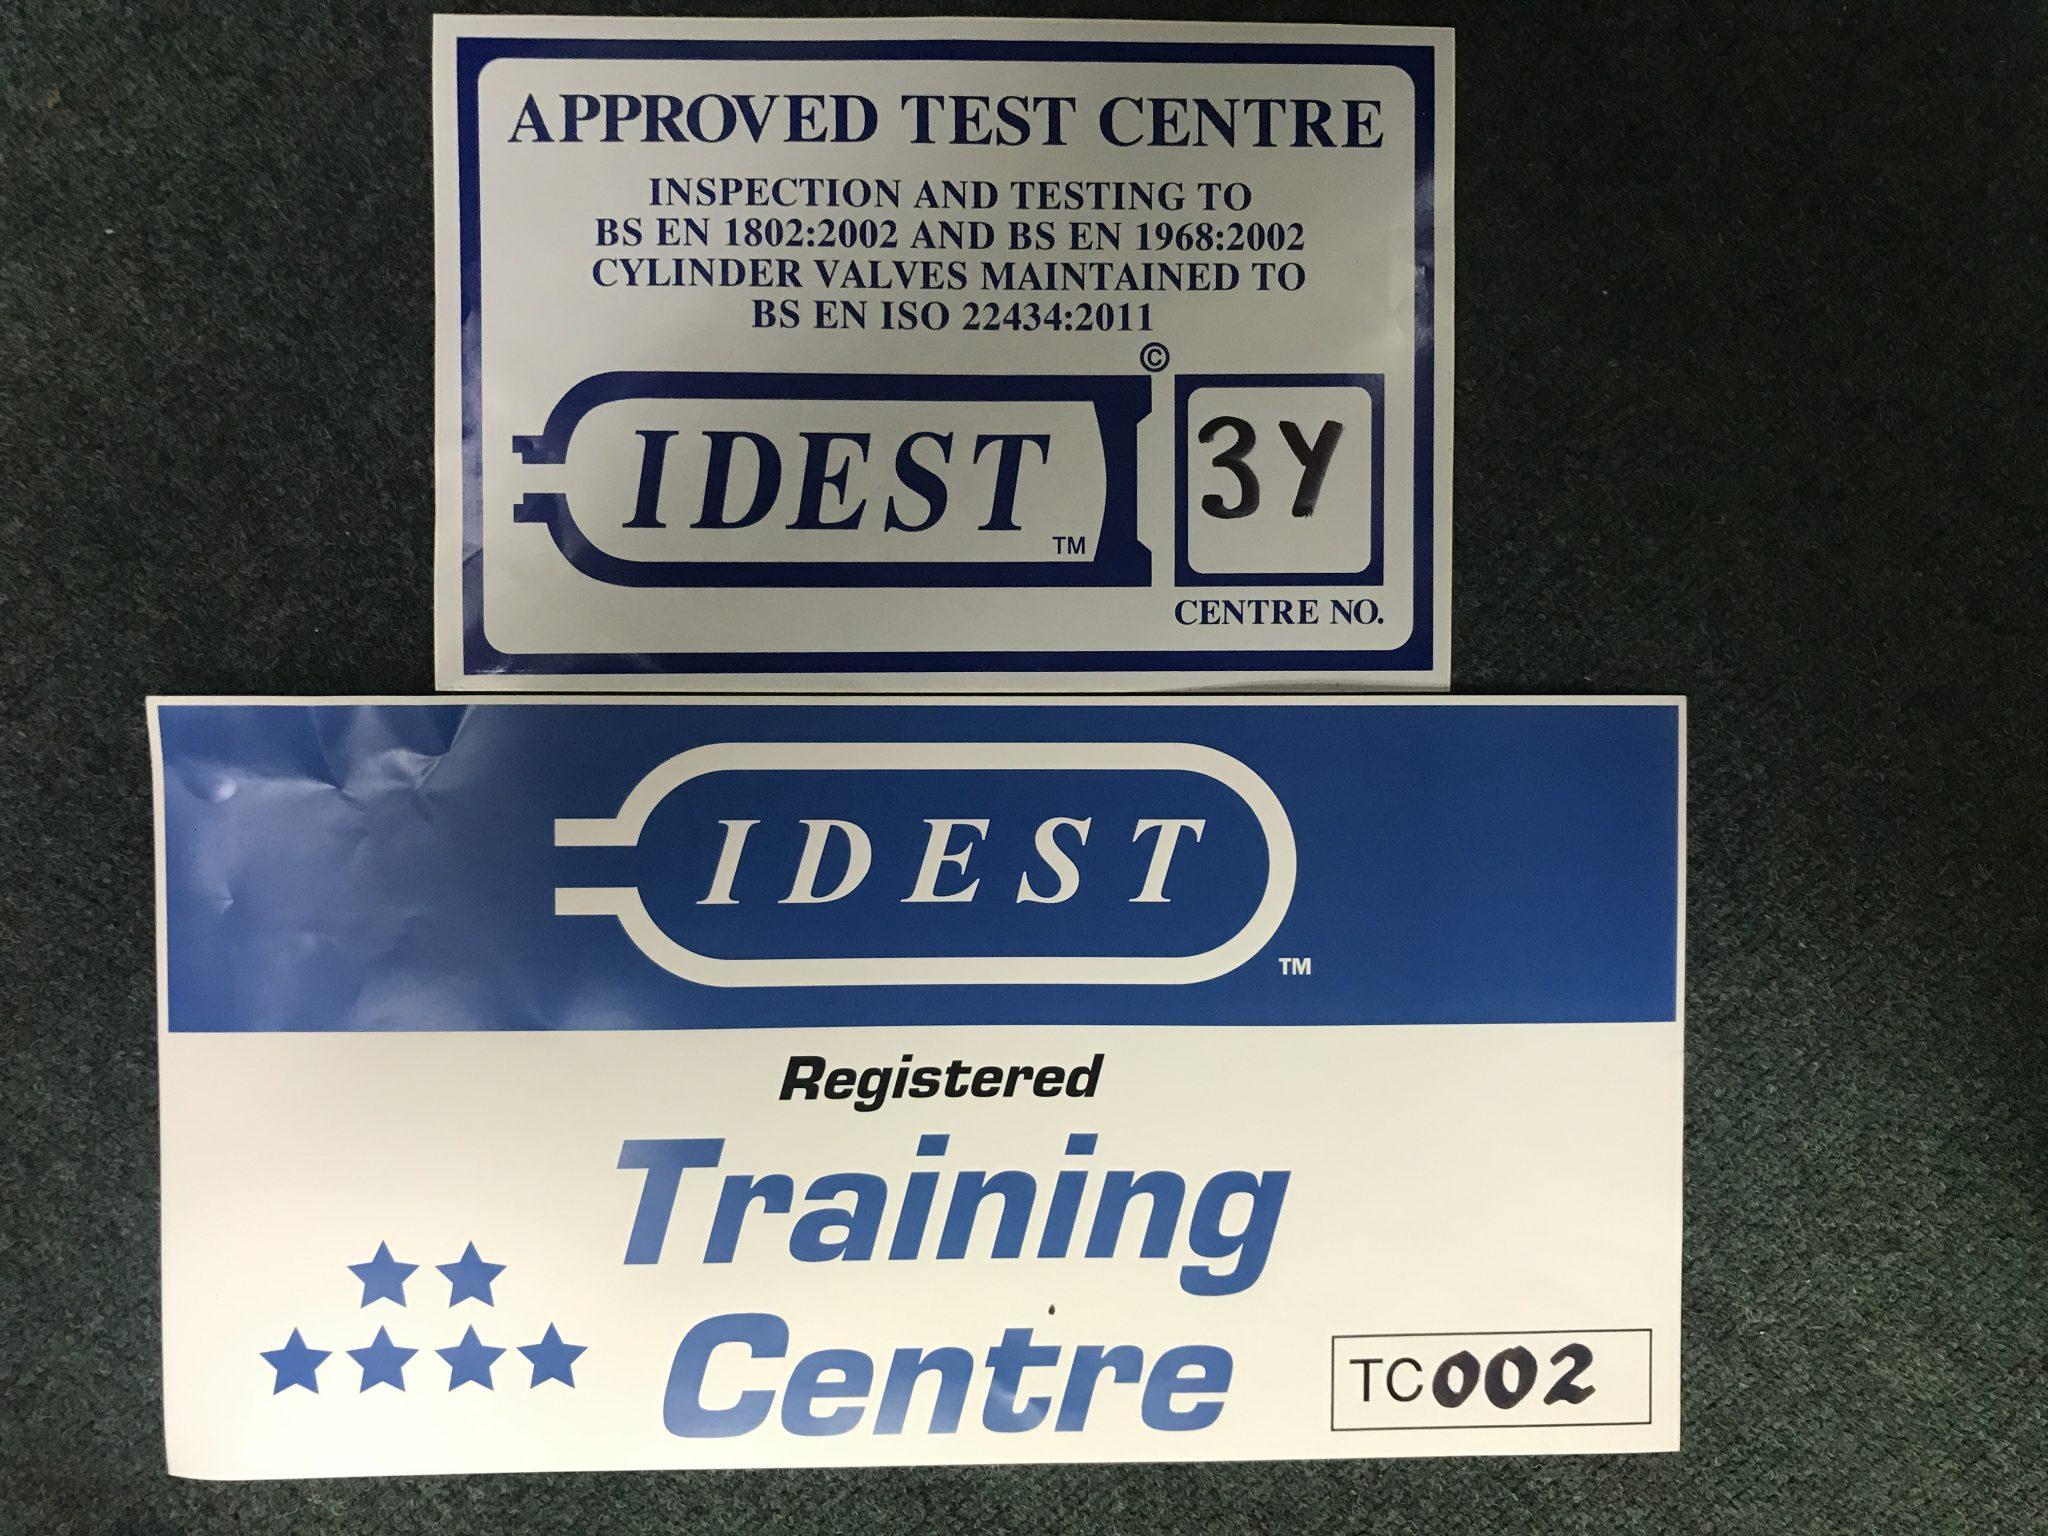 IDEST Training Centre